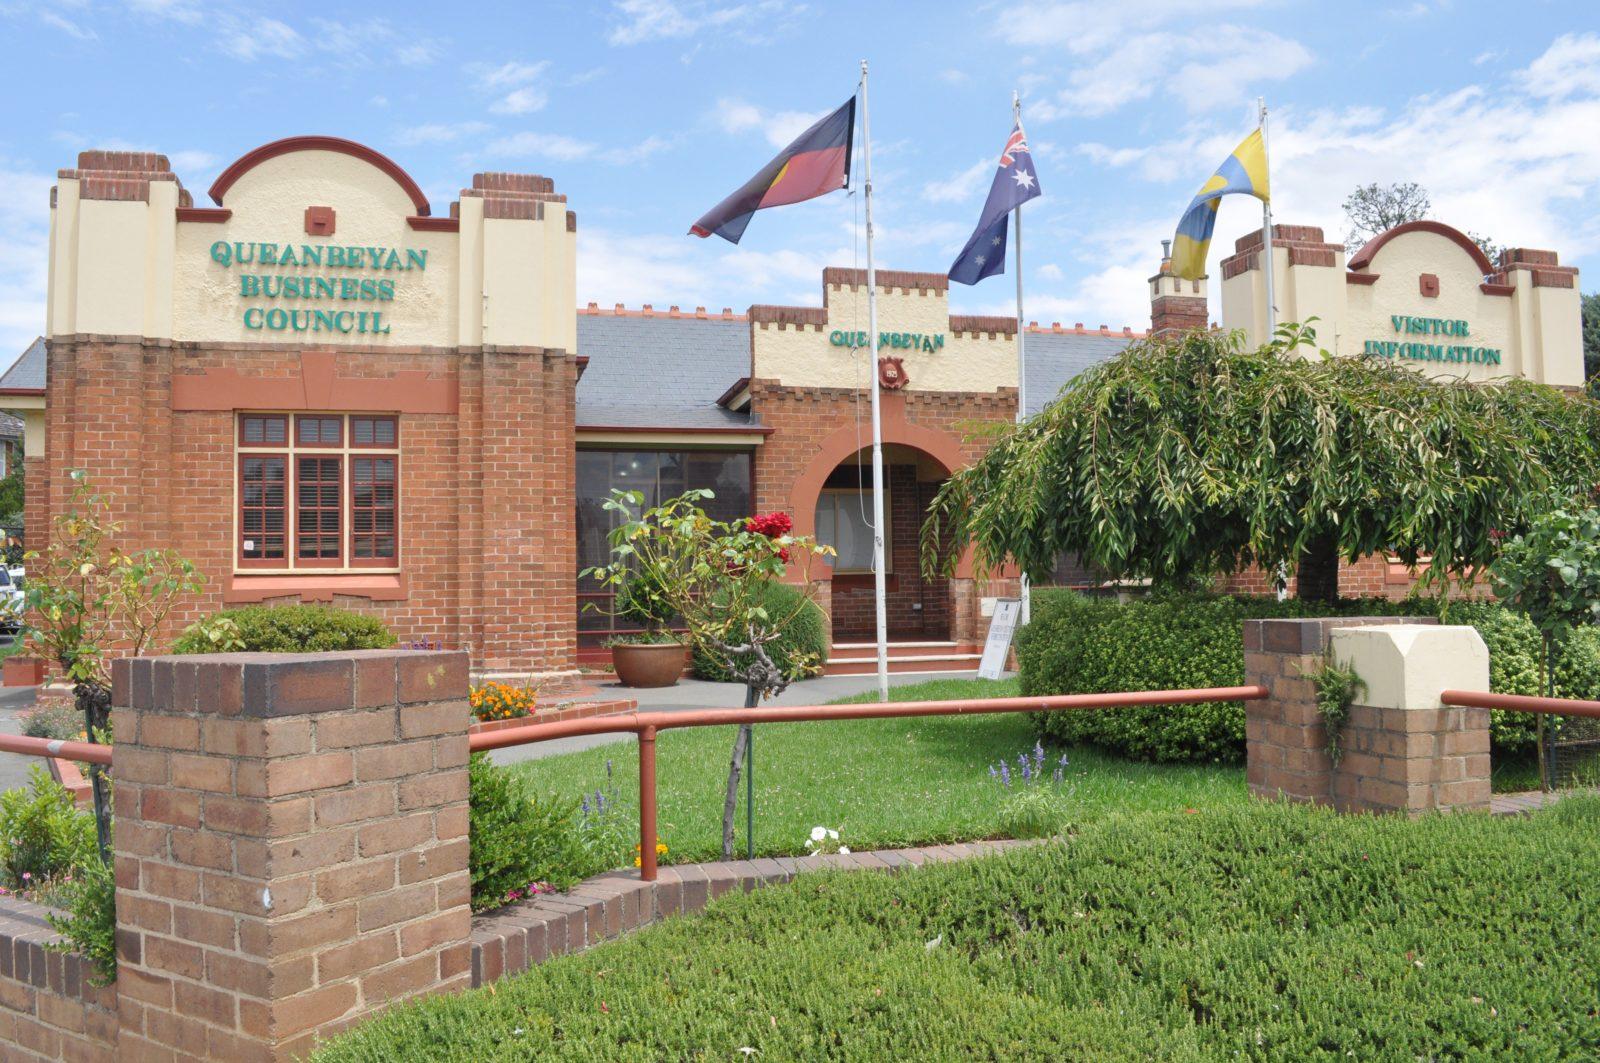 Queanbeyan Visitor Information Centre